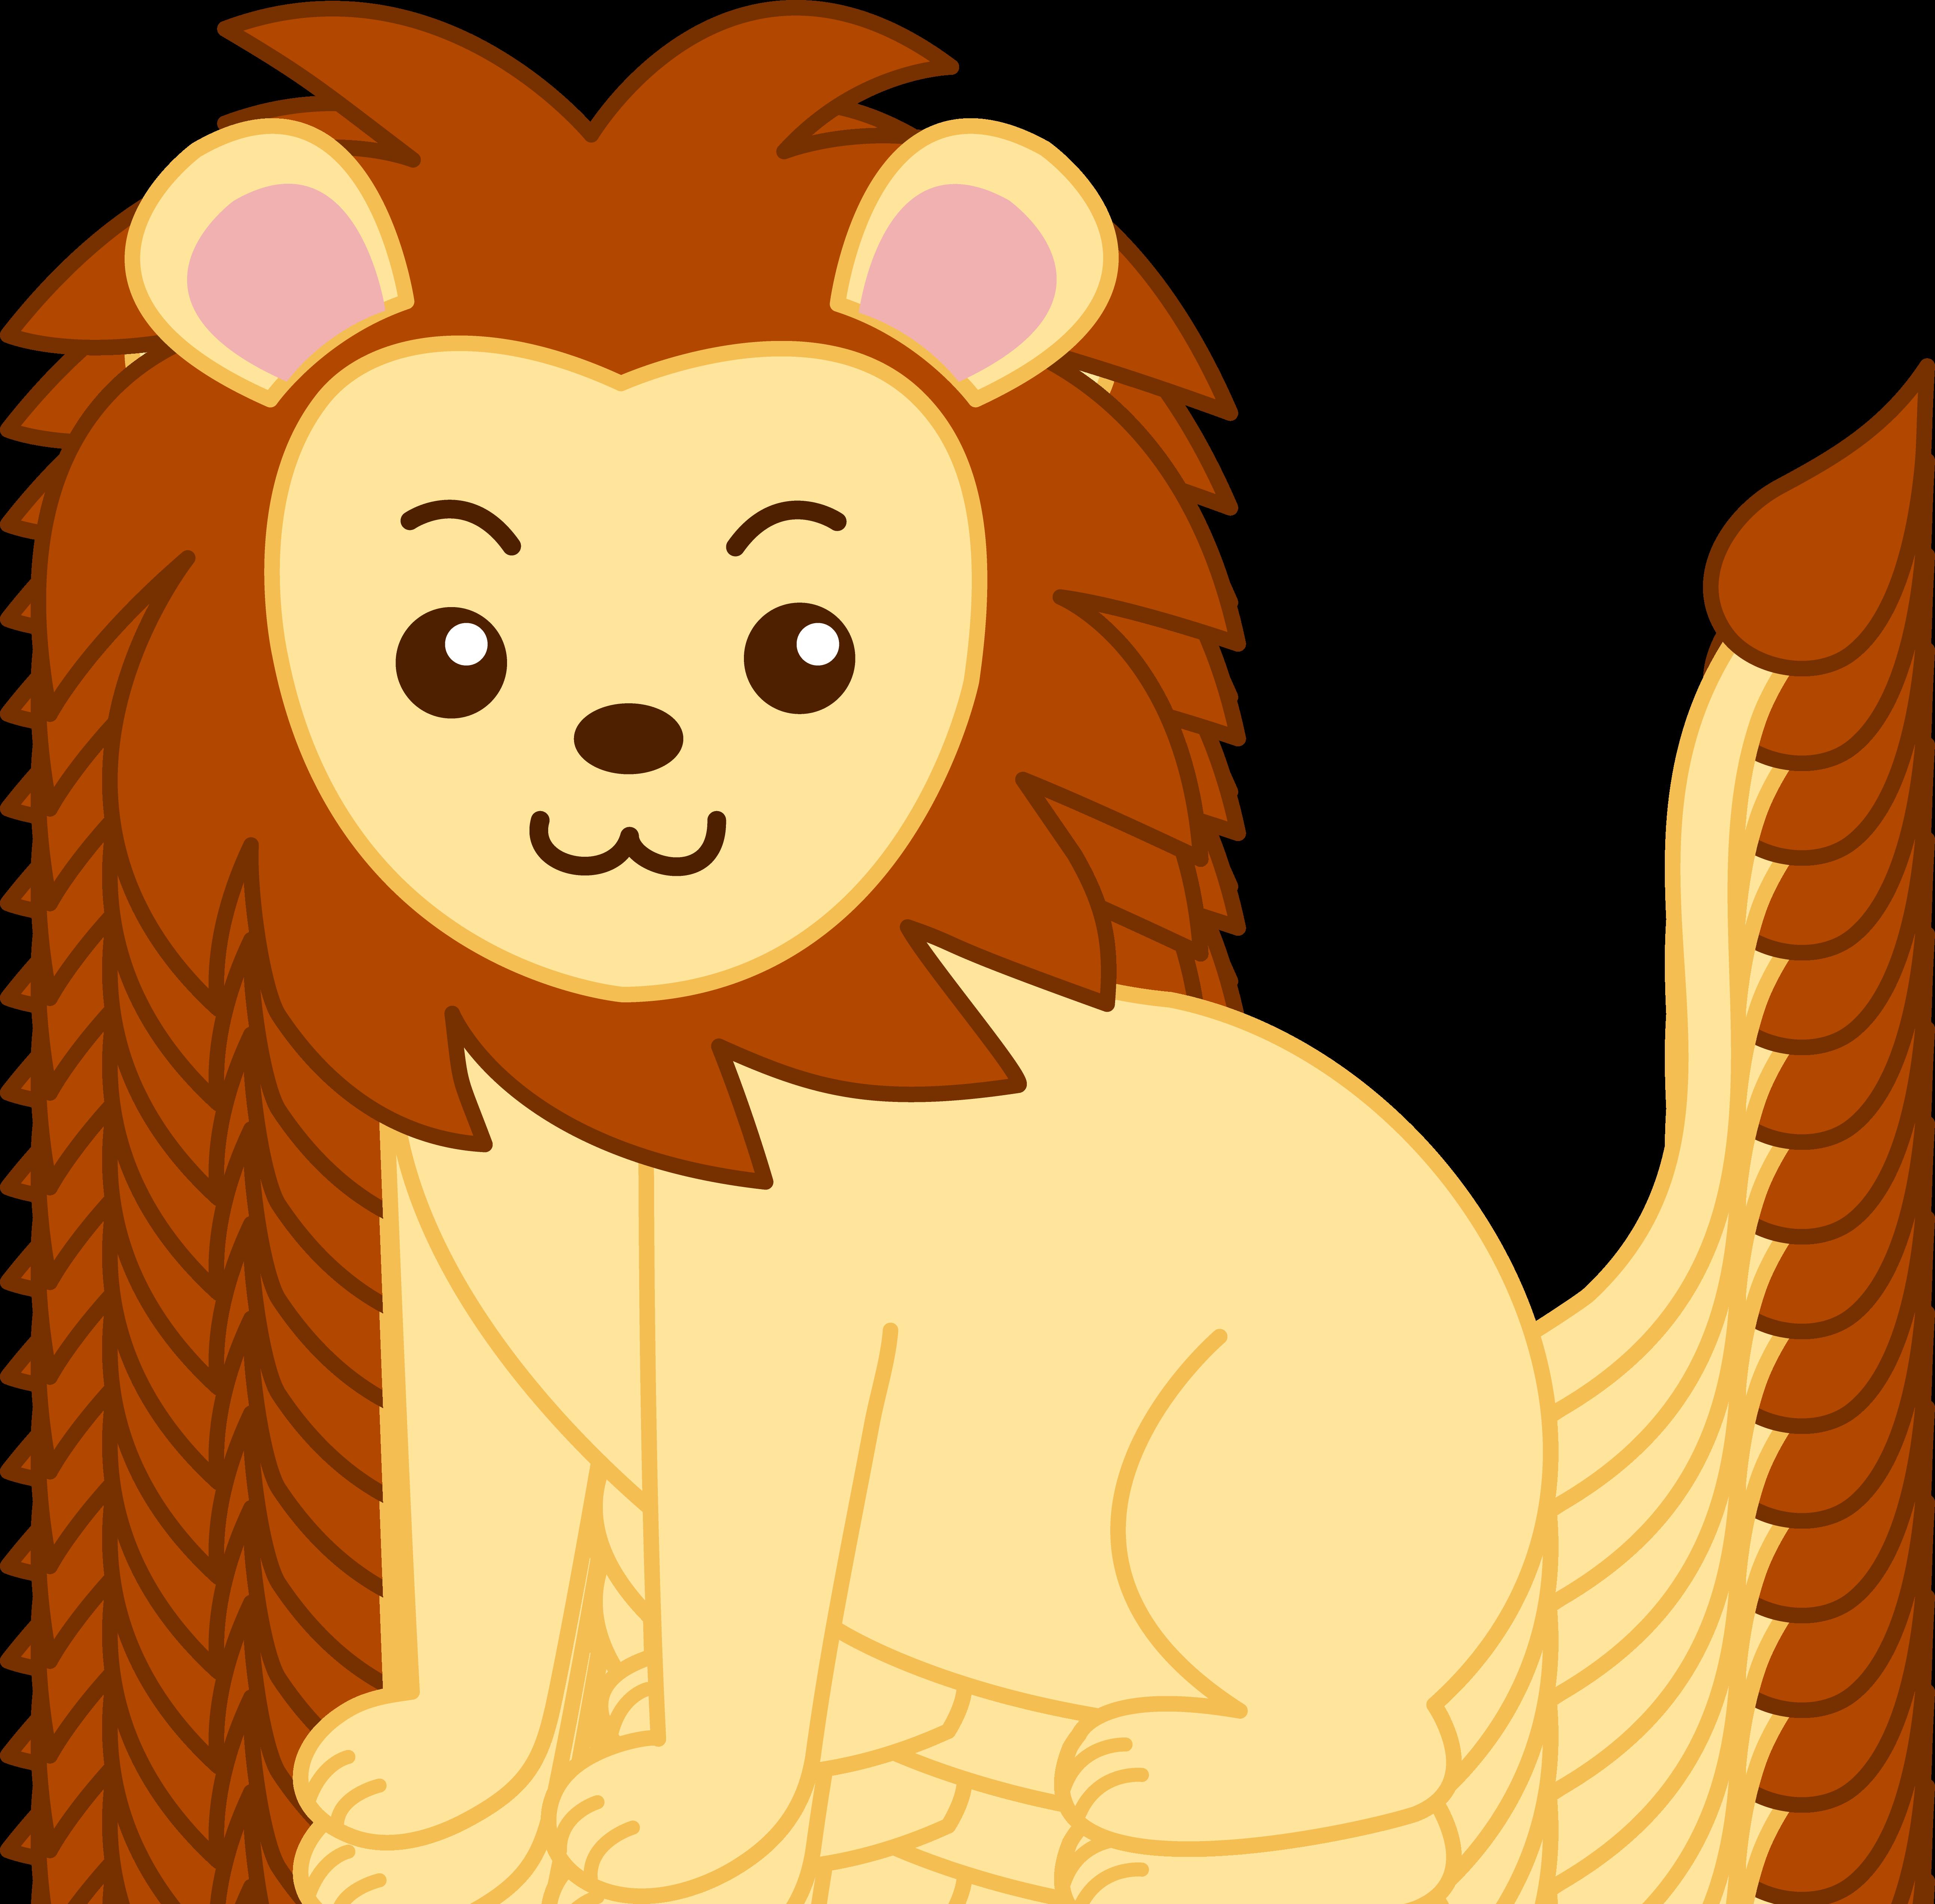 baby lion clipart clipart panda free clipart images rh clipartpanda com baby lion clipart png baby lion cartoon clipart